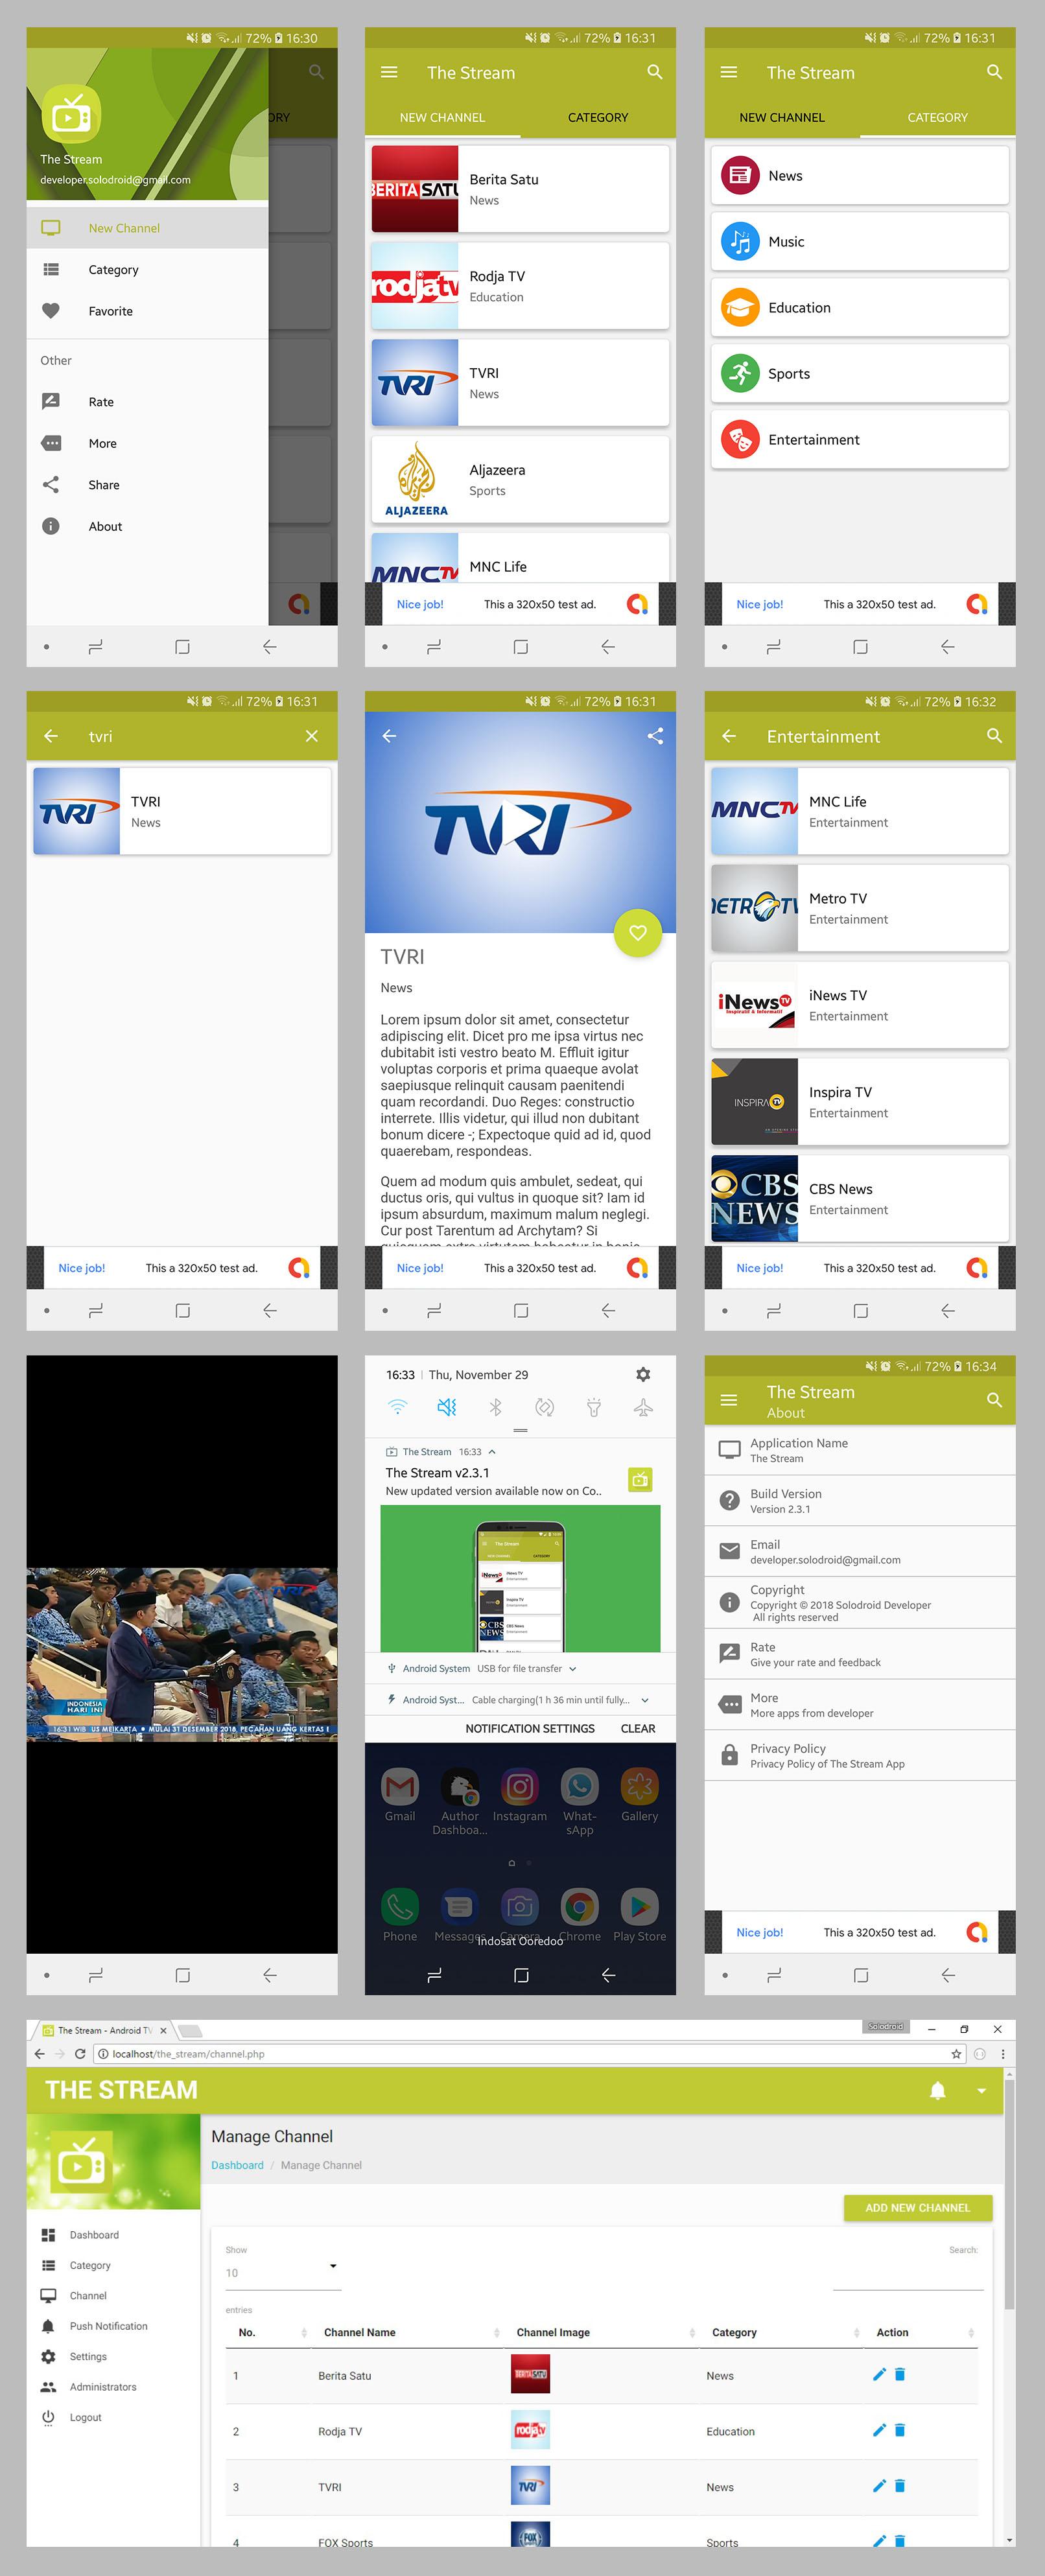 The Stream - TV & Video Streaming App - 3